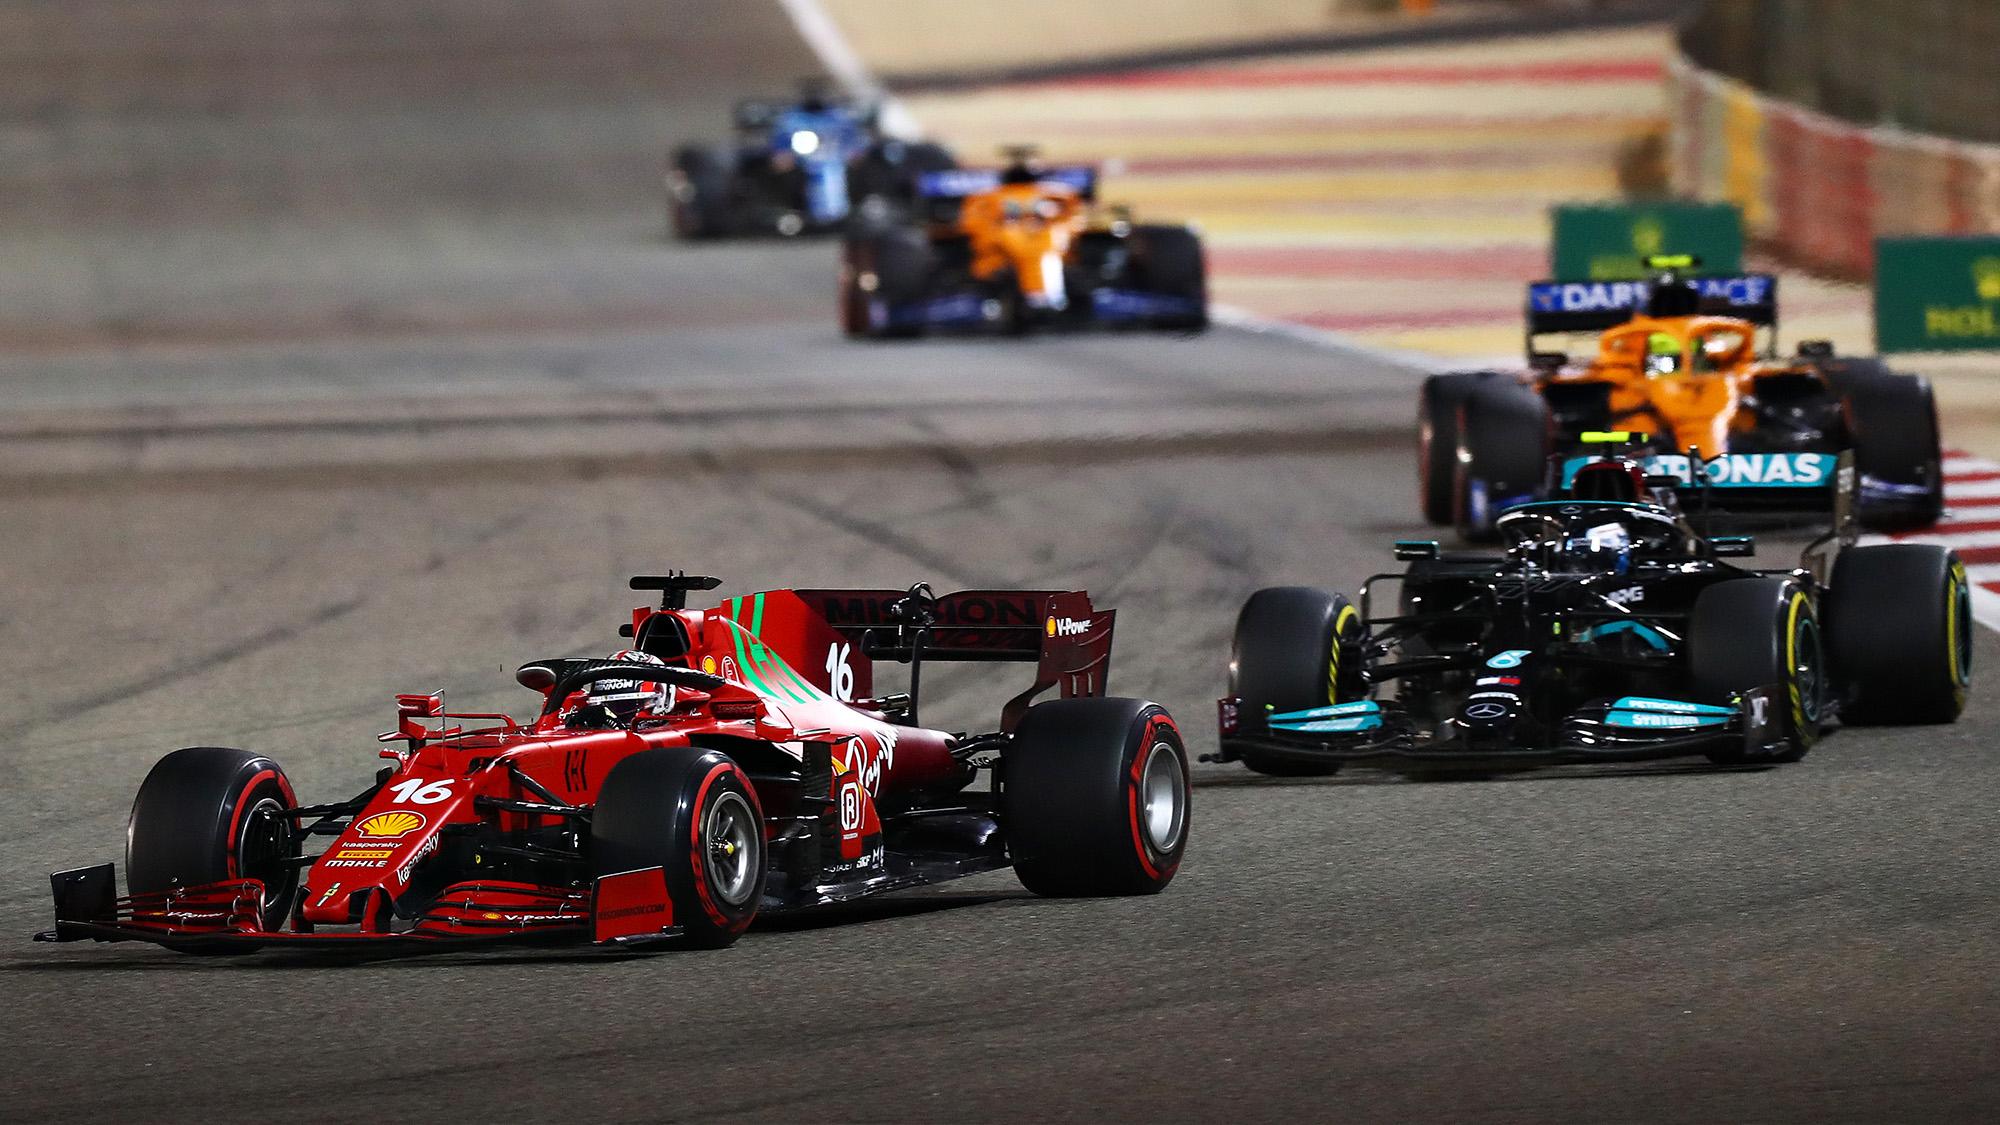 Valtteri Bottas follows Charles Leclerc at the start of the 2021 Bahrain Grand Prix